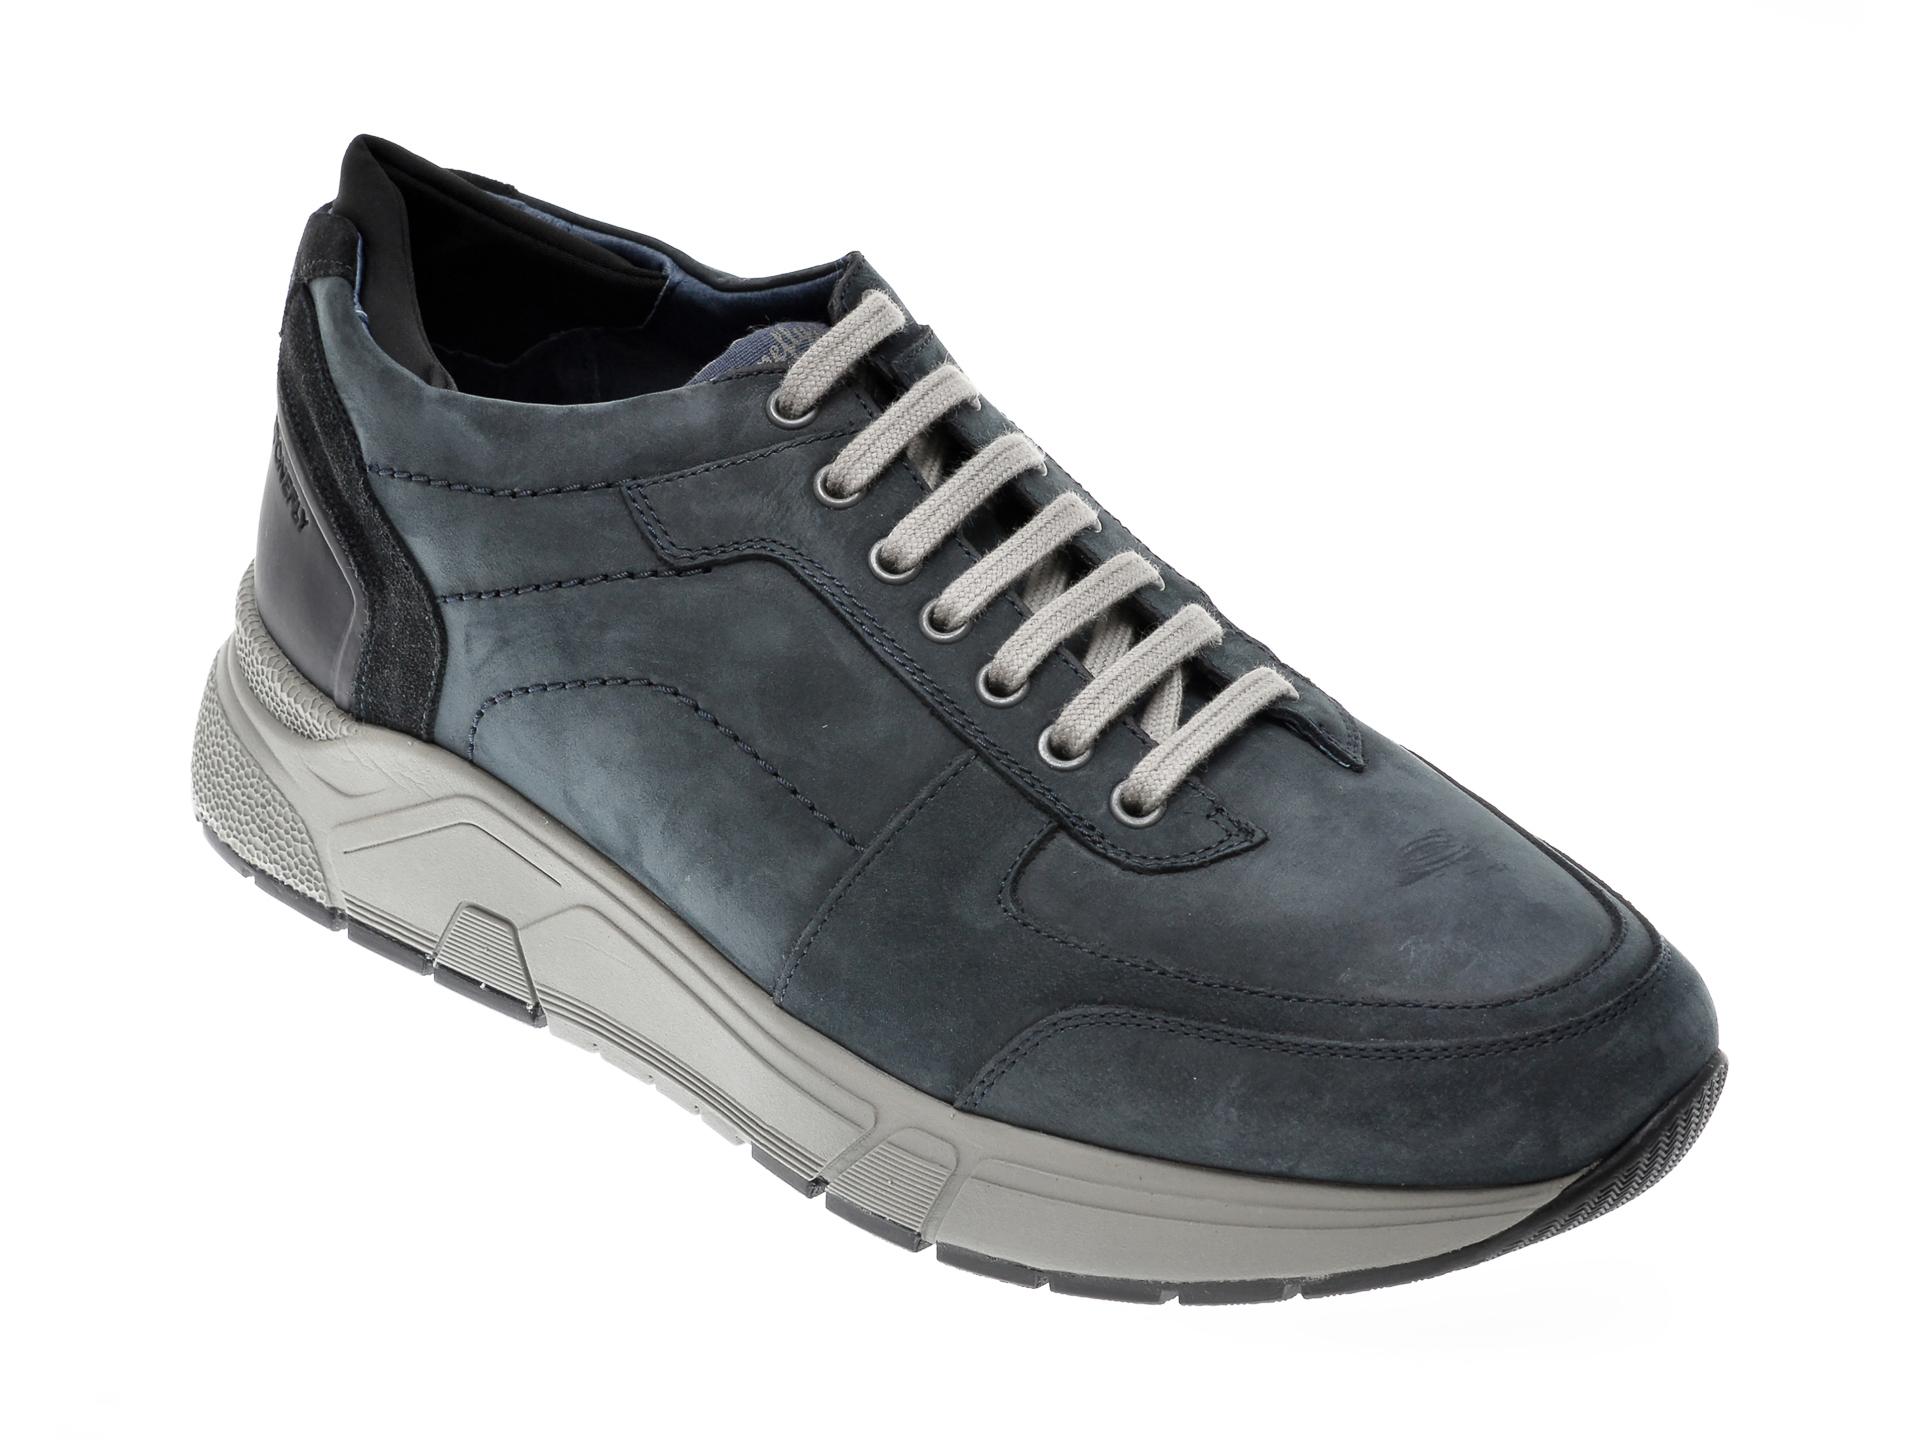 Pantofi STONEFLY bleumarin, ACTION1, din piele intoarsa New